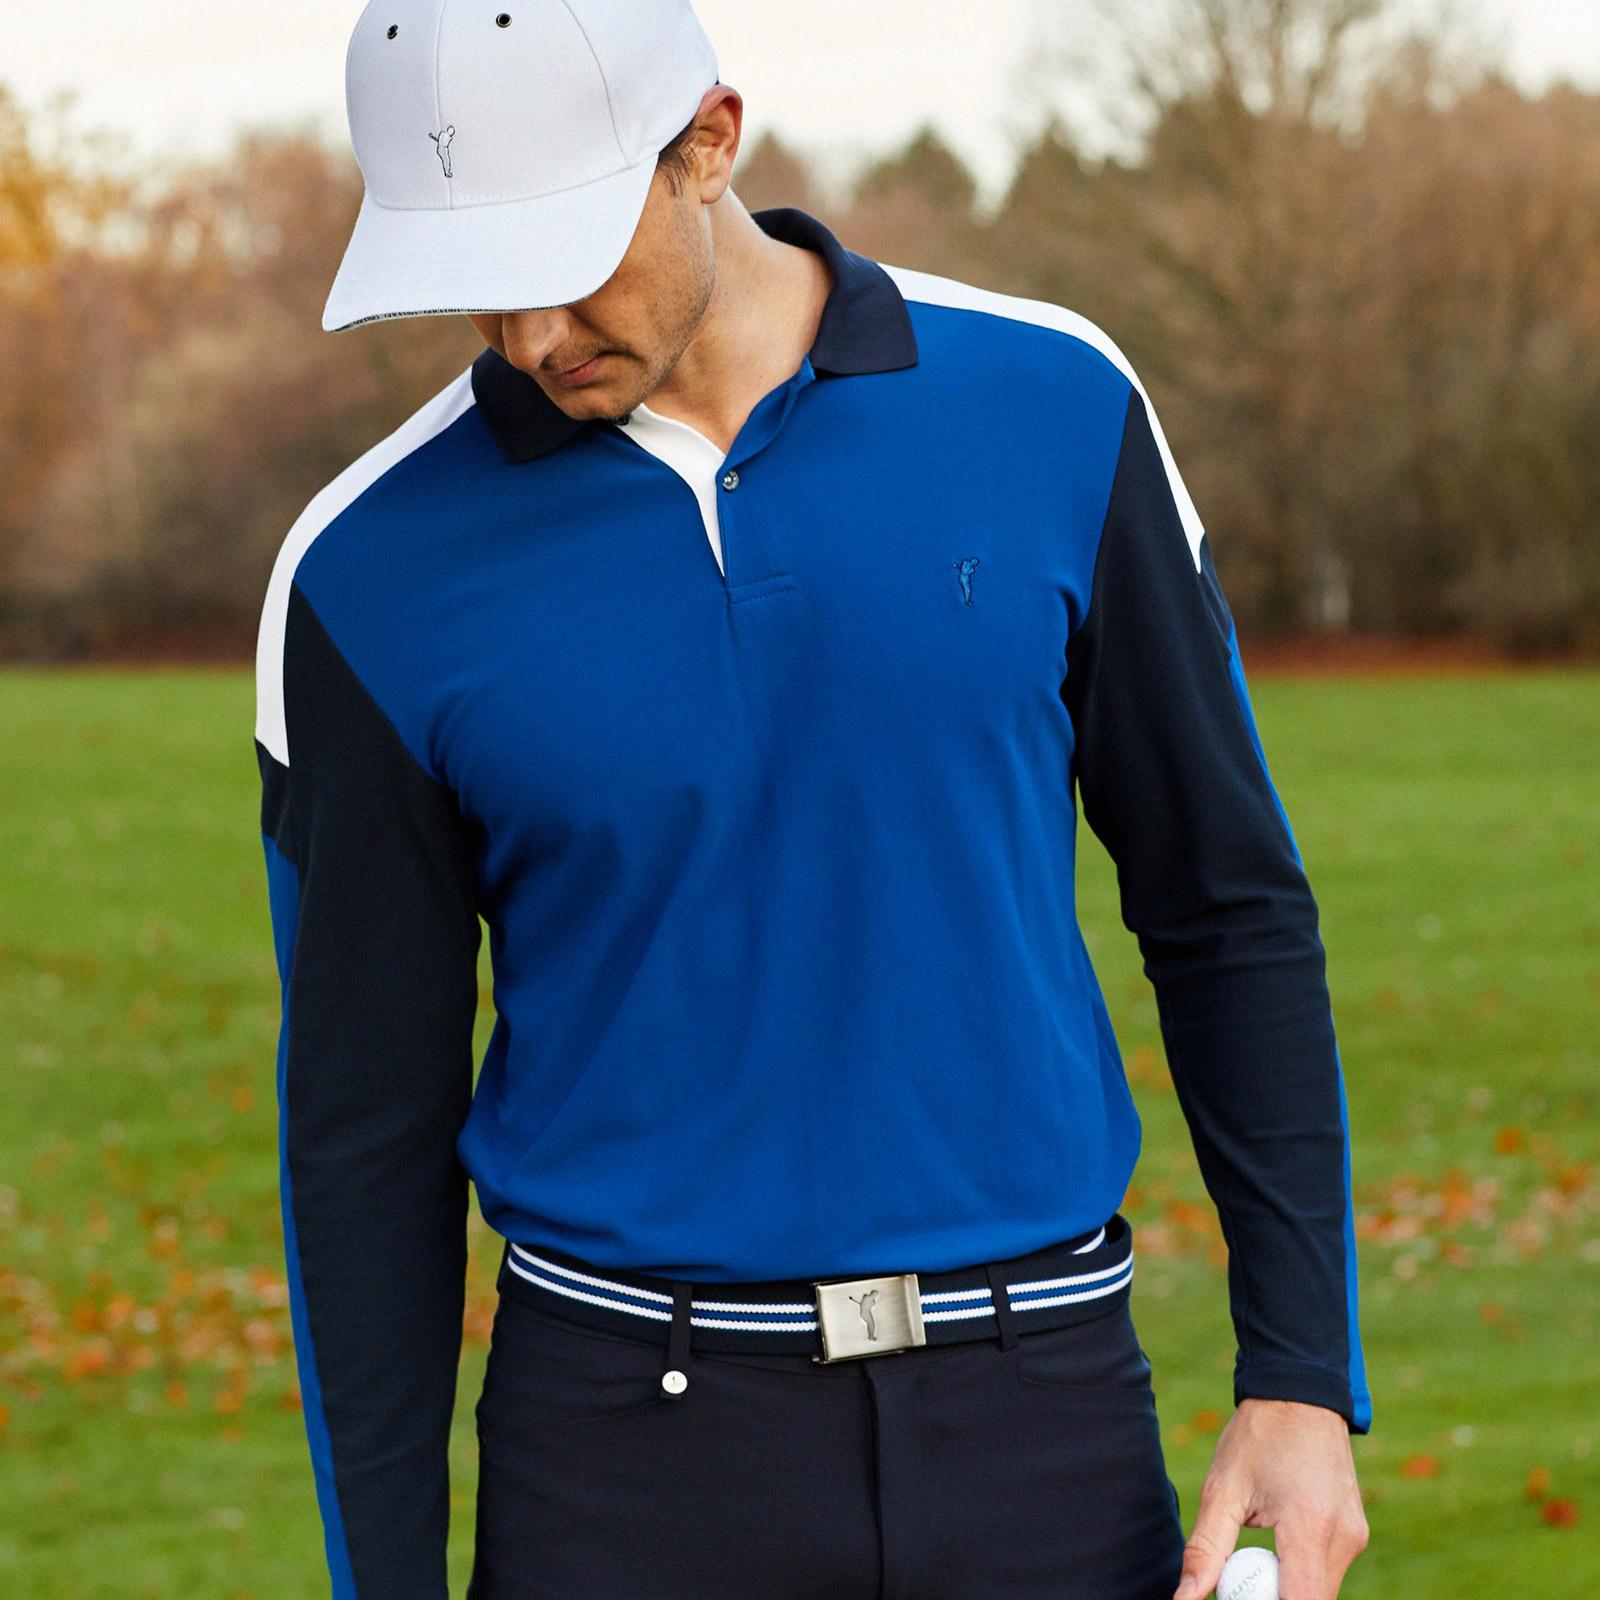 Herren Langarm Funktions-Golfpolo mit Moisture Management im Pro Look